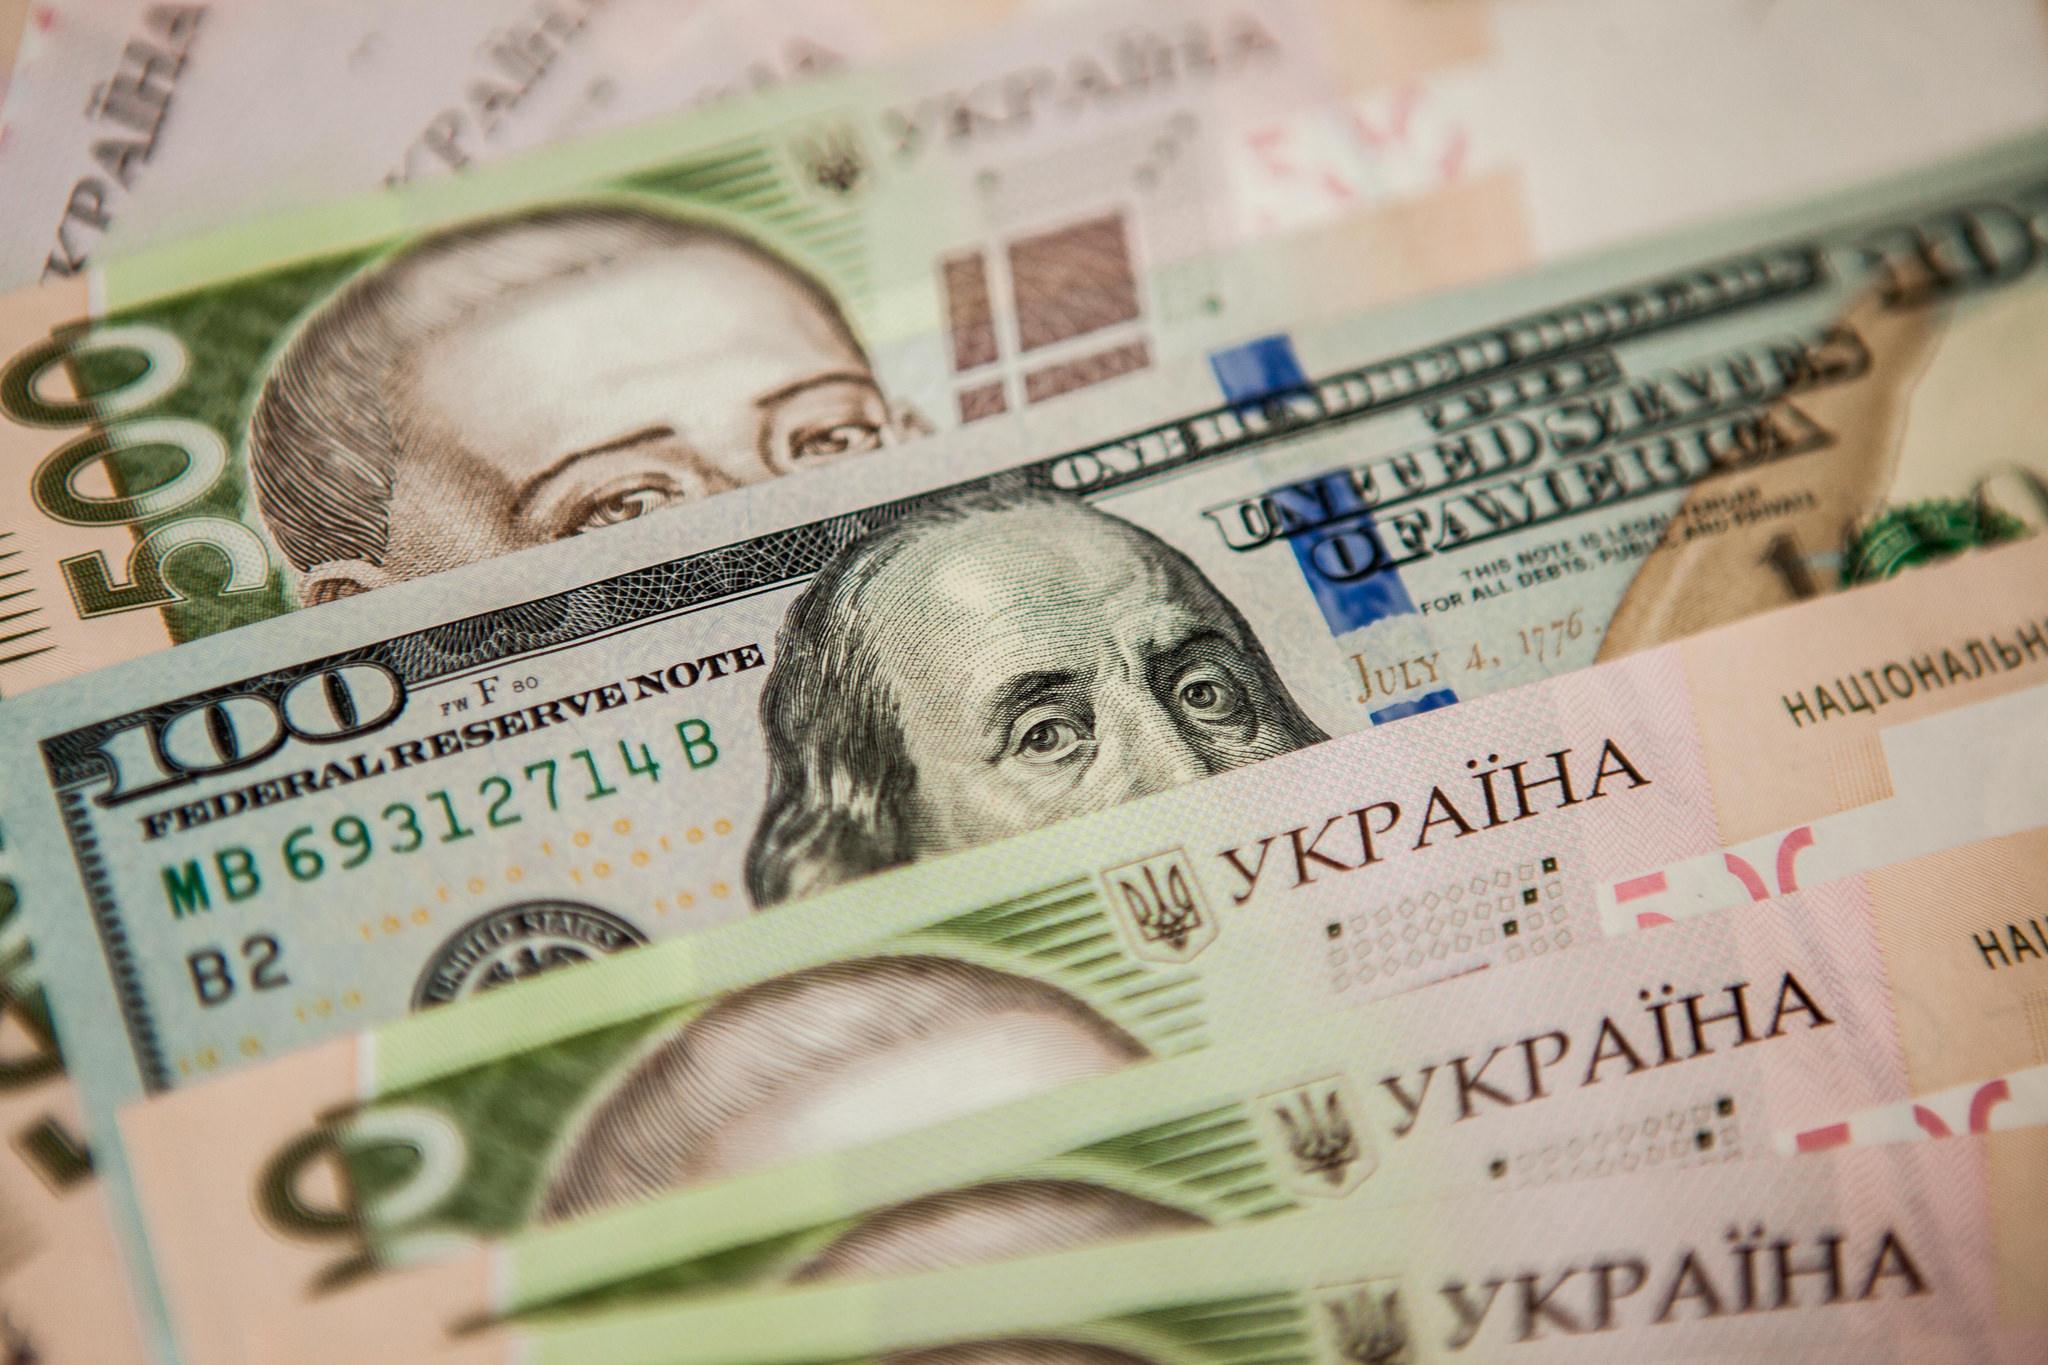 DC5m Ukraine mix in ukrainian Created at 2018-08-16 06 45 2fde13684392a